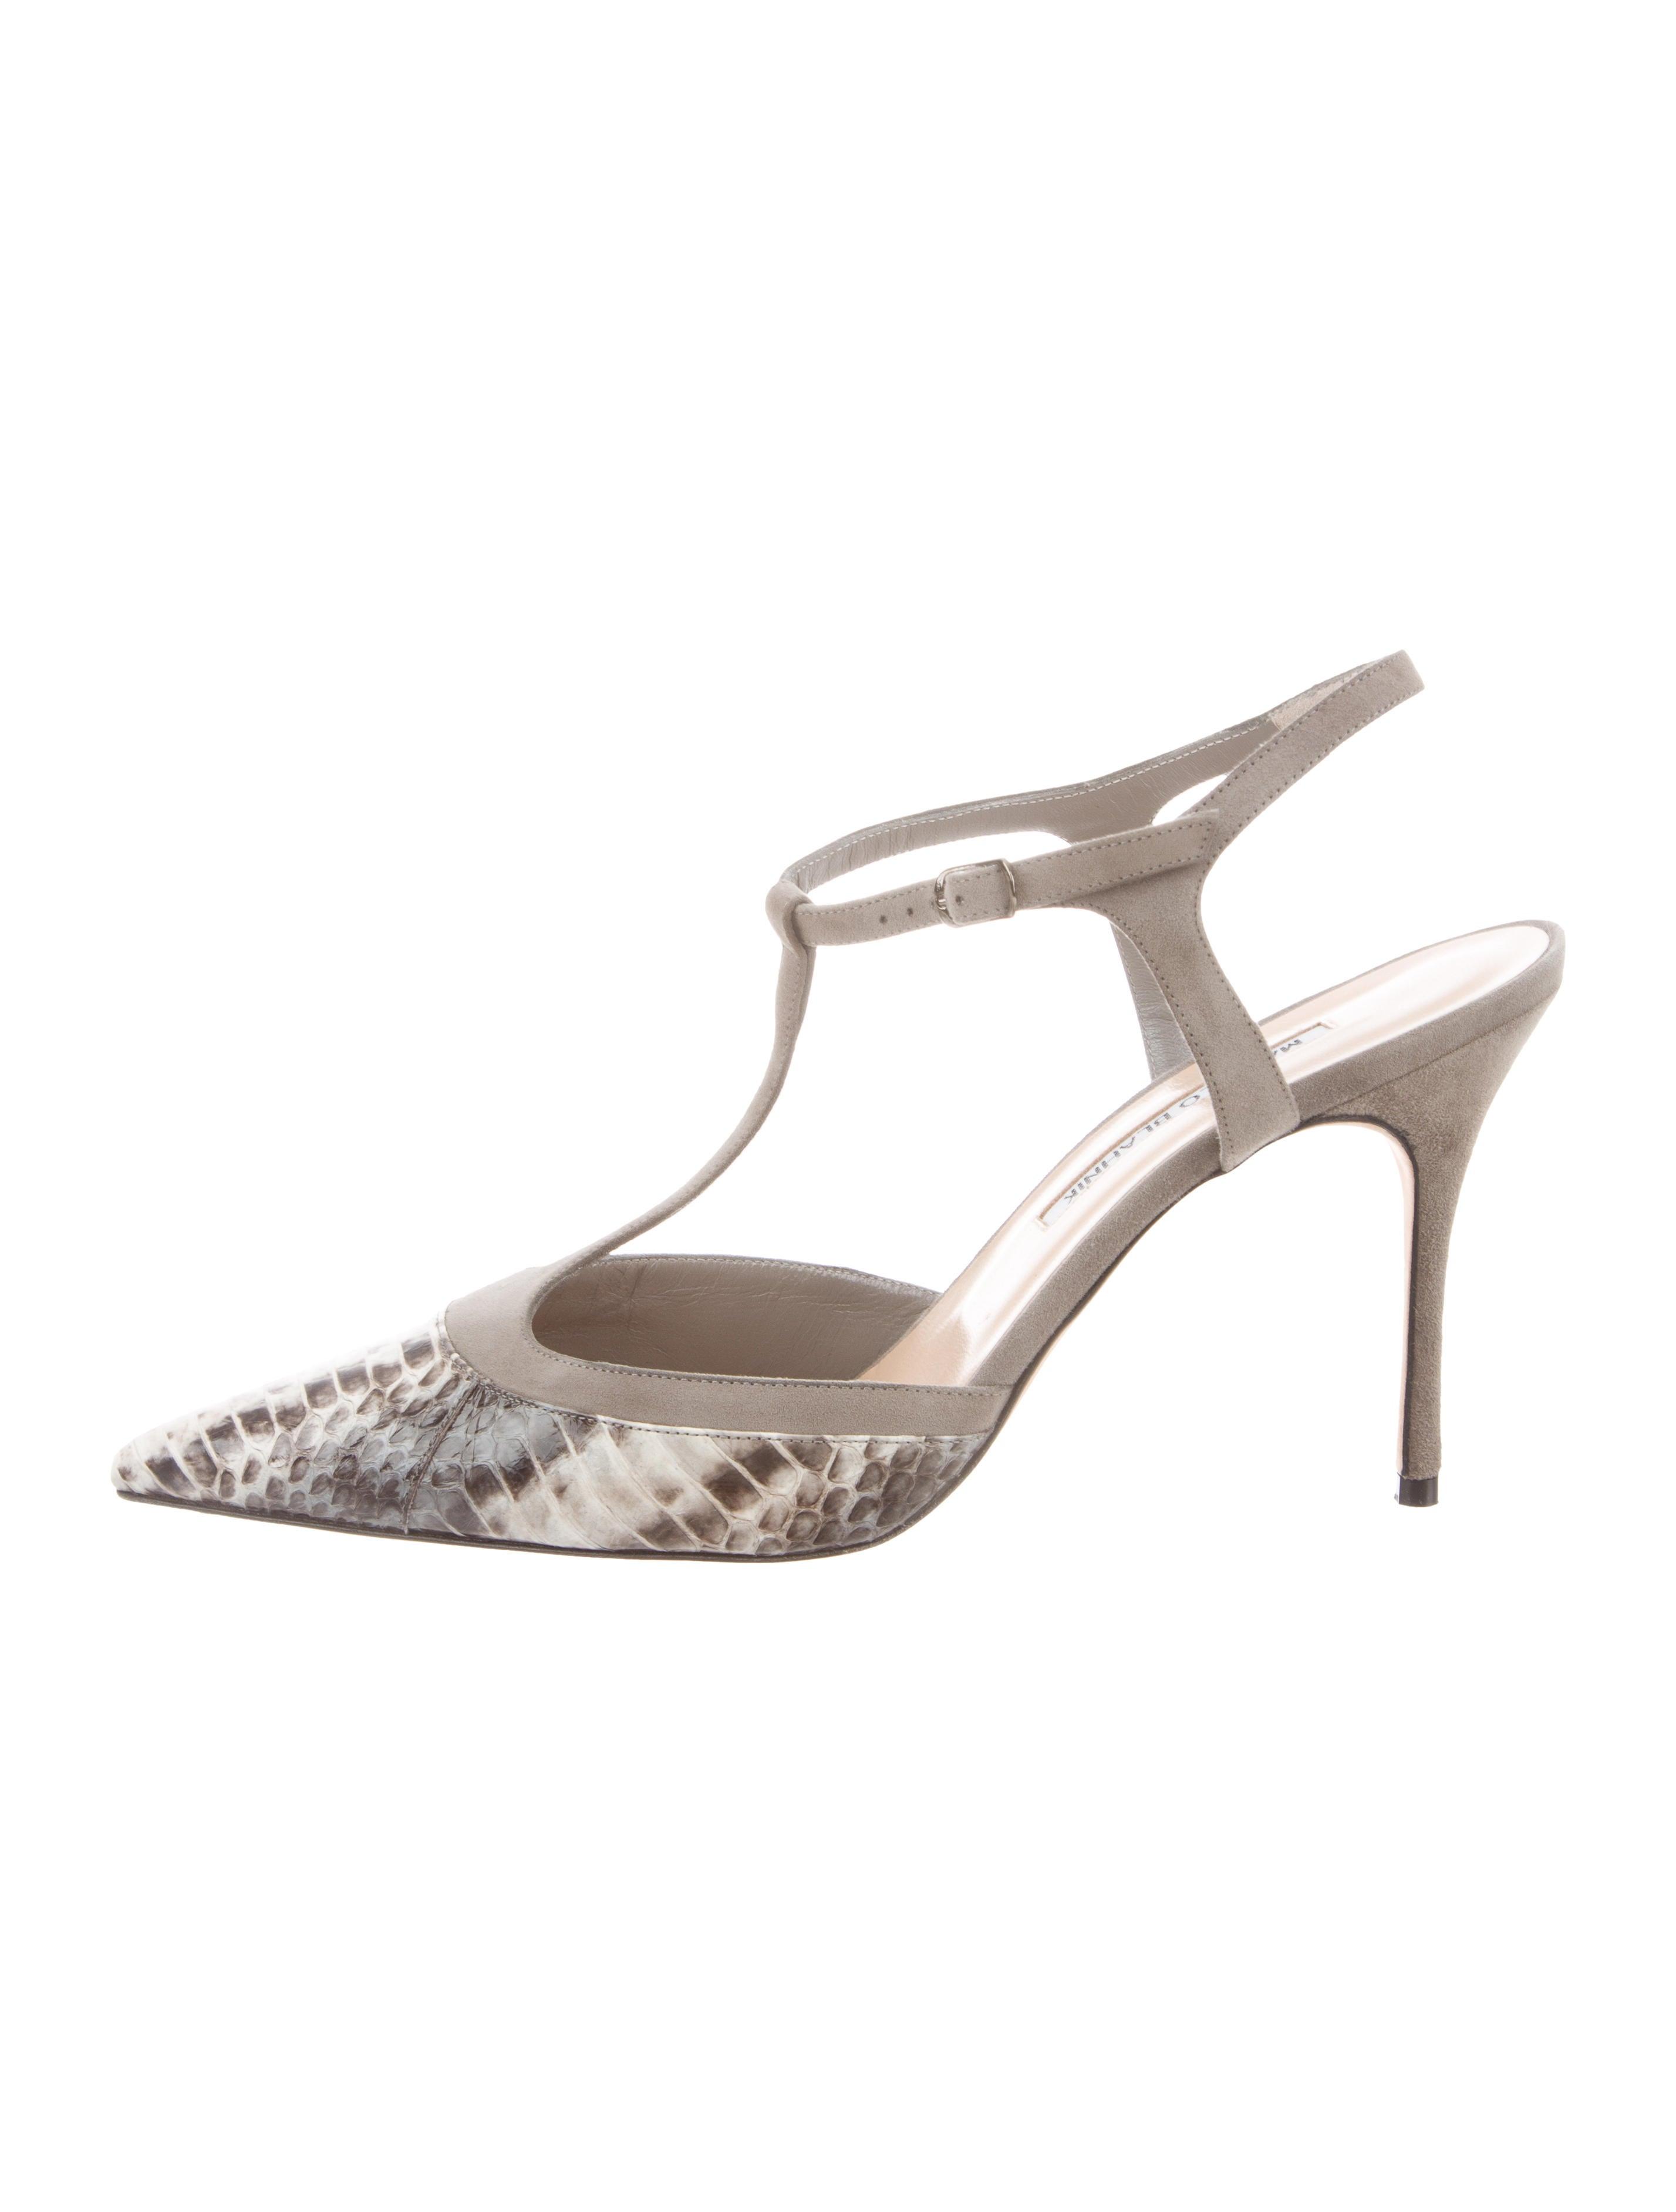 76cbfe6f9bbf Manolo Blahnik Python T-Strap Sandals - Shoes - MOO107578